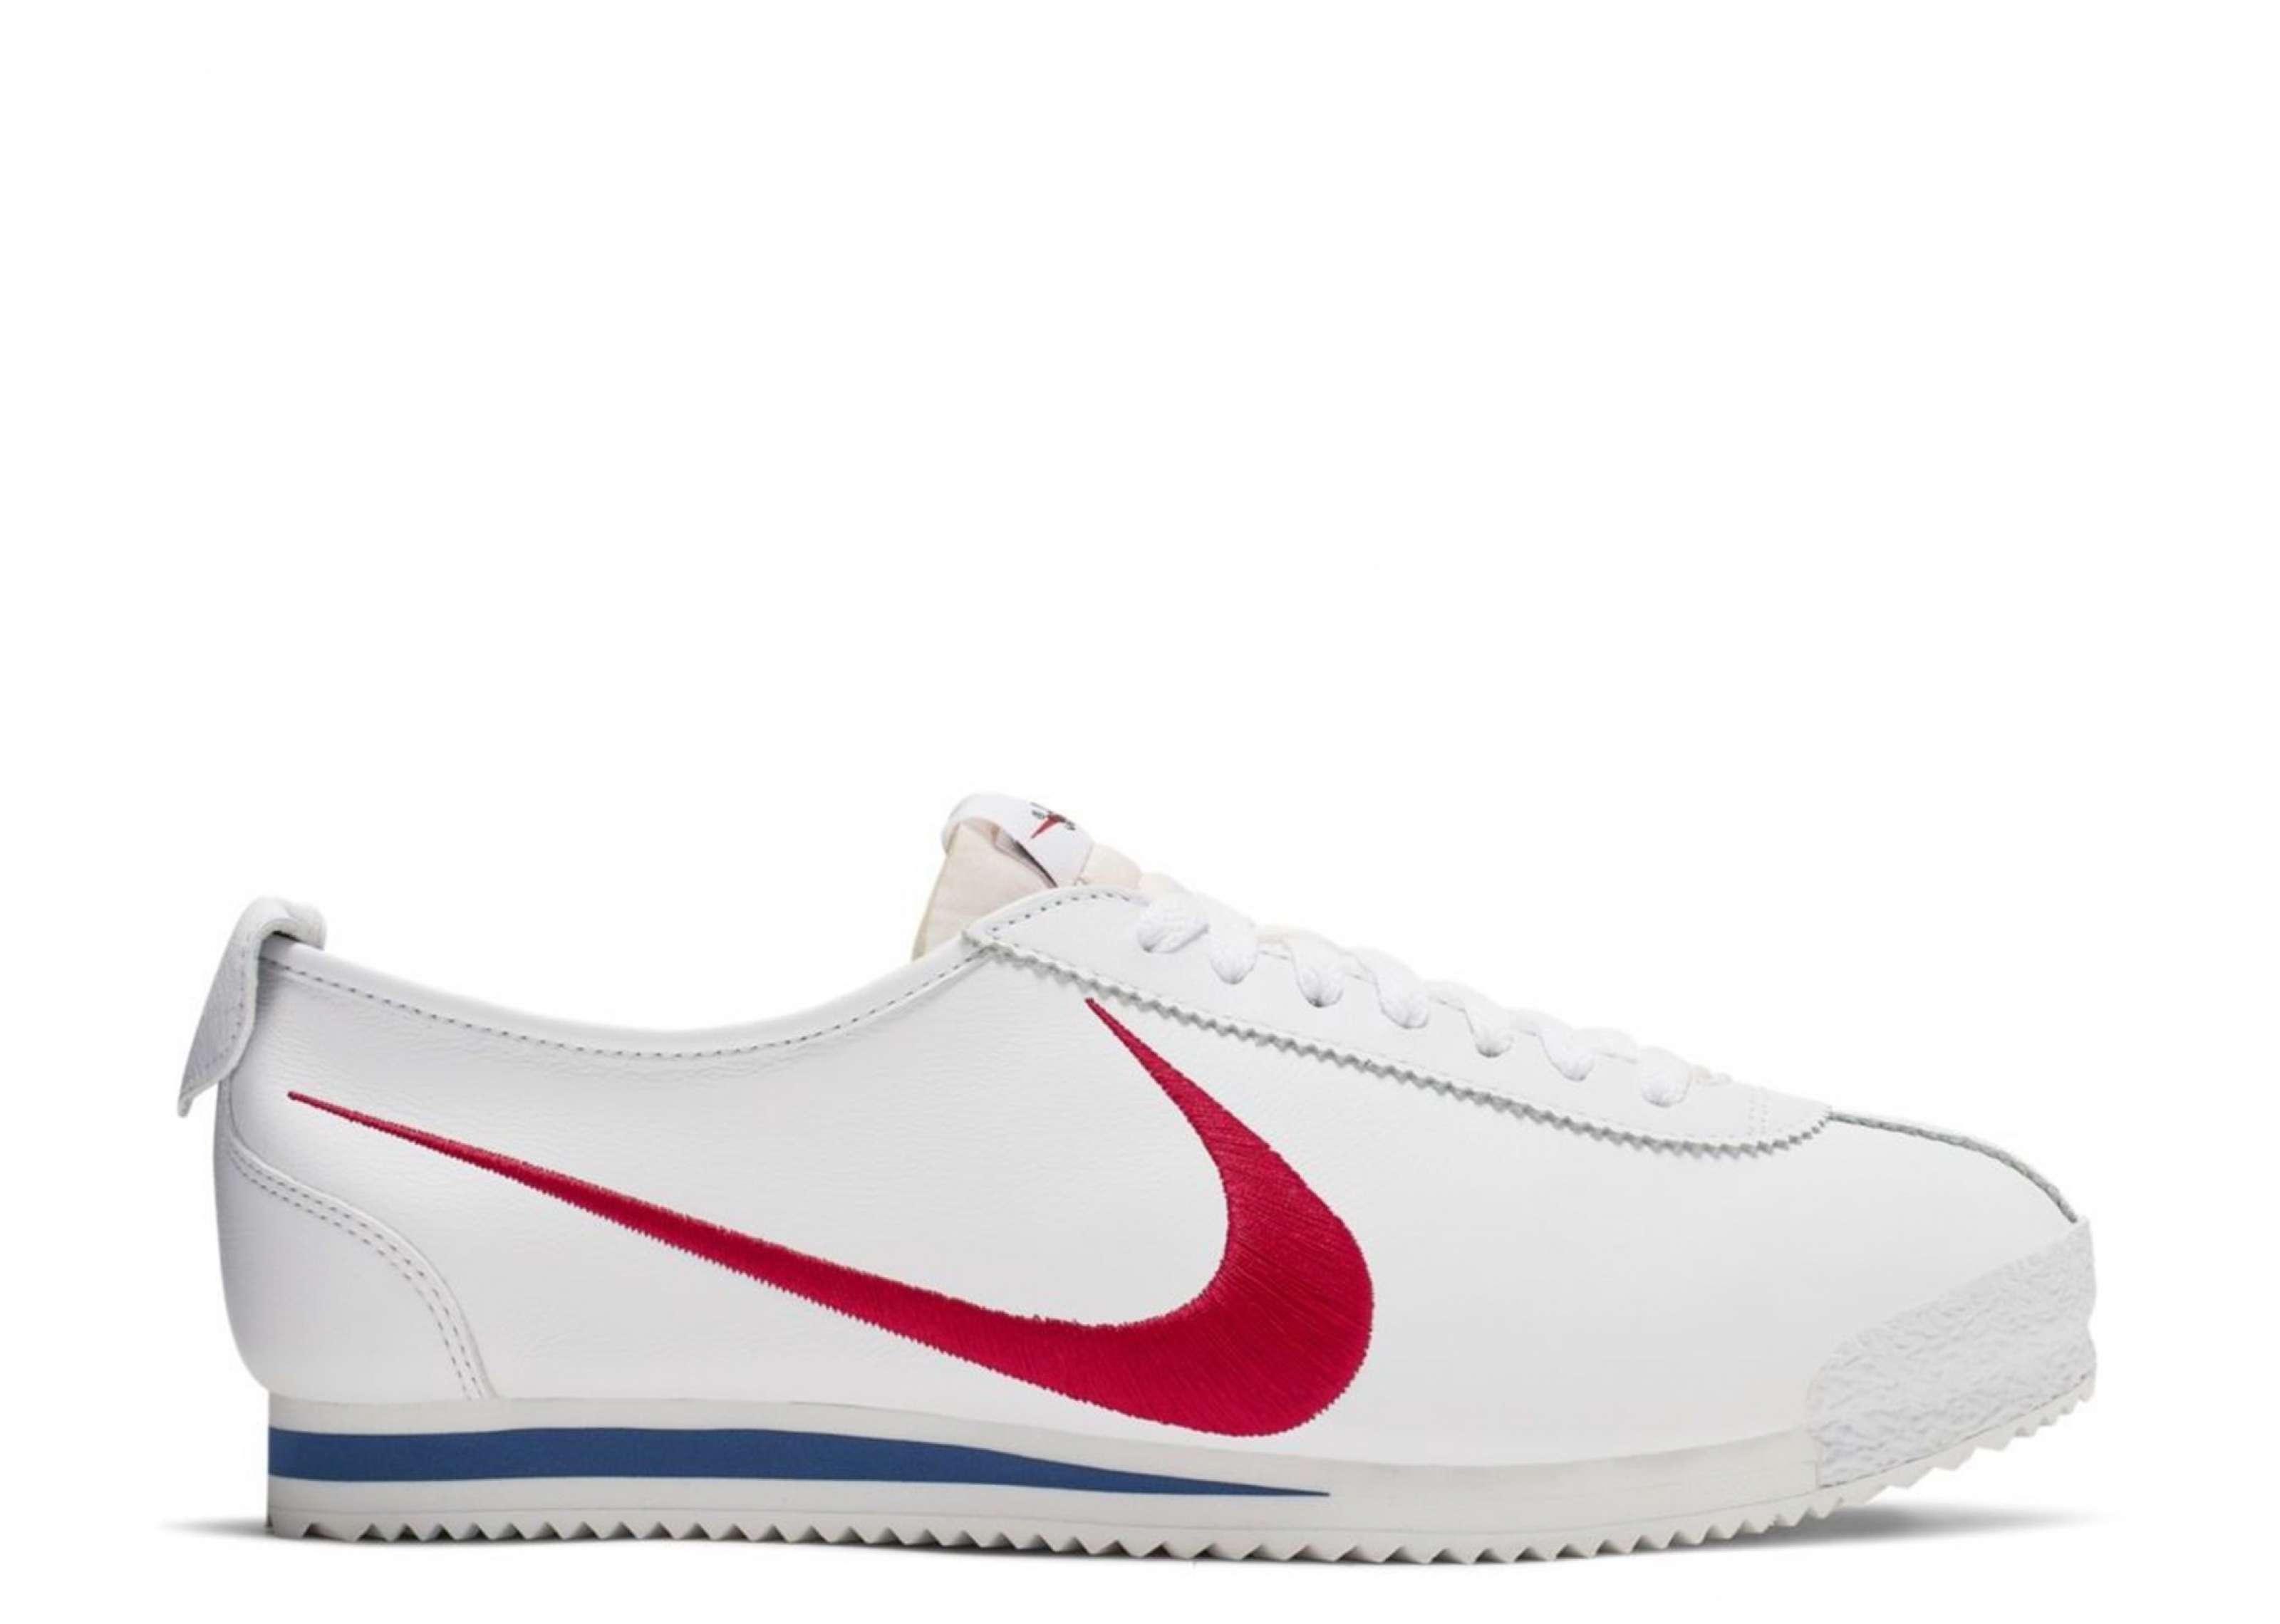 on sale 07625 3d544 Kick Avenue - Authentic Sneakers